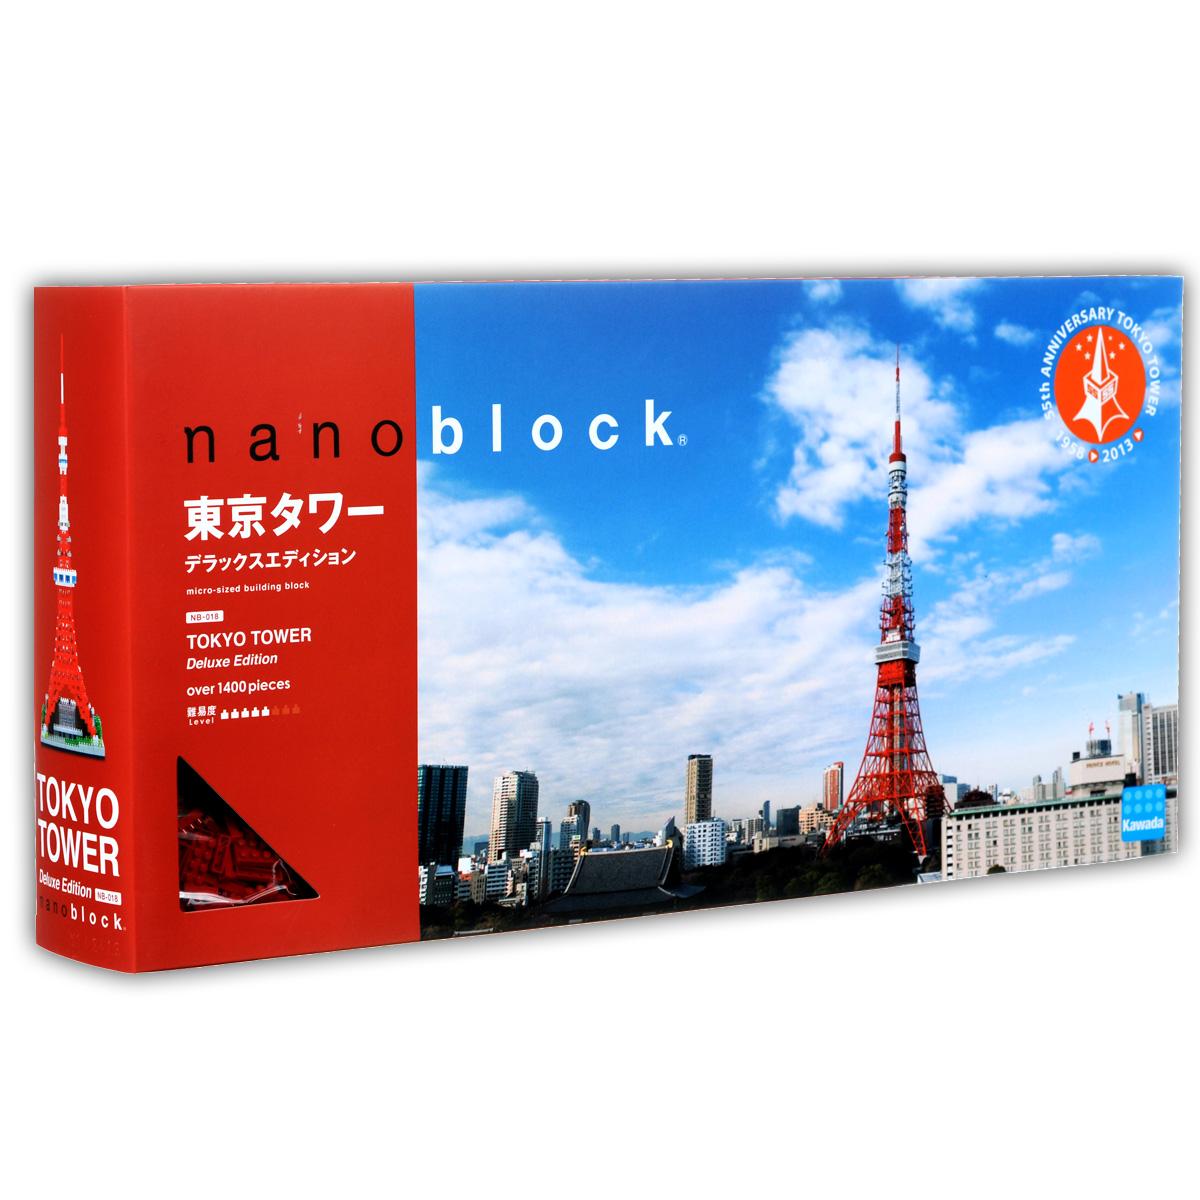 Nanoblock Мини-конструктор Токийская Телебашня Deluxe nanoblock паровоз